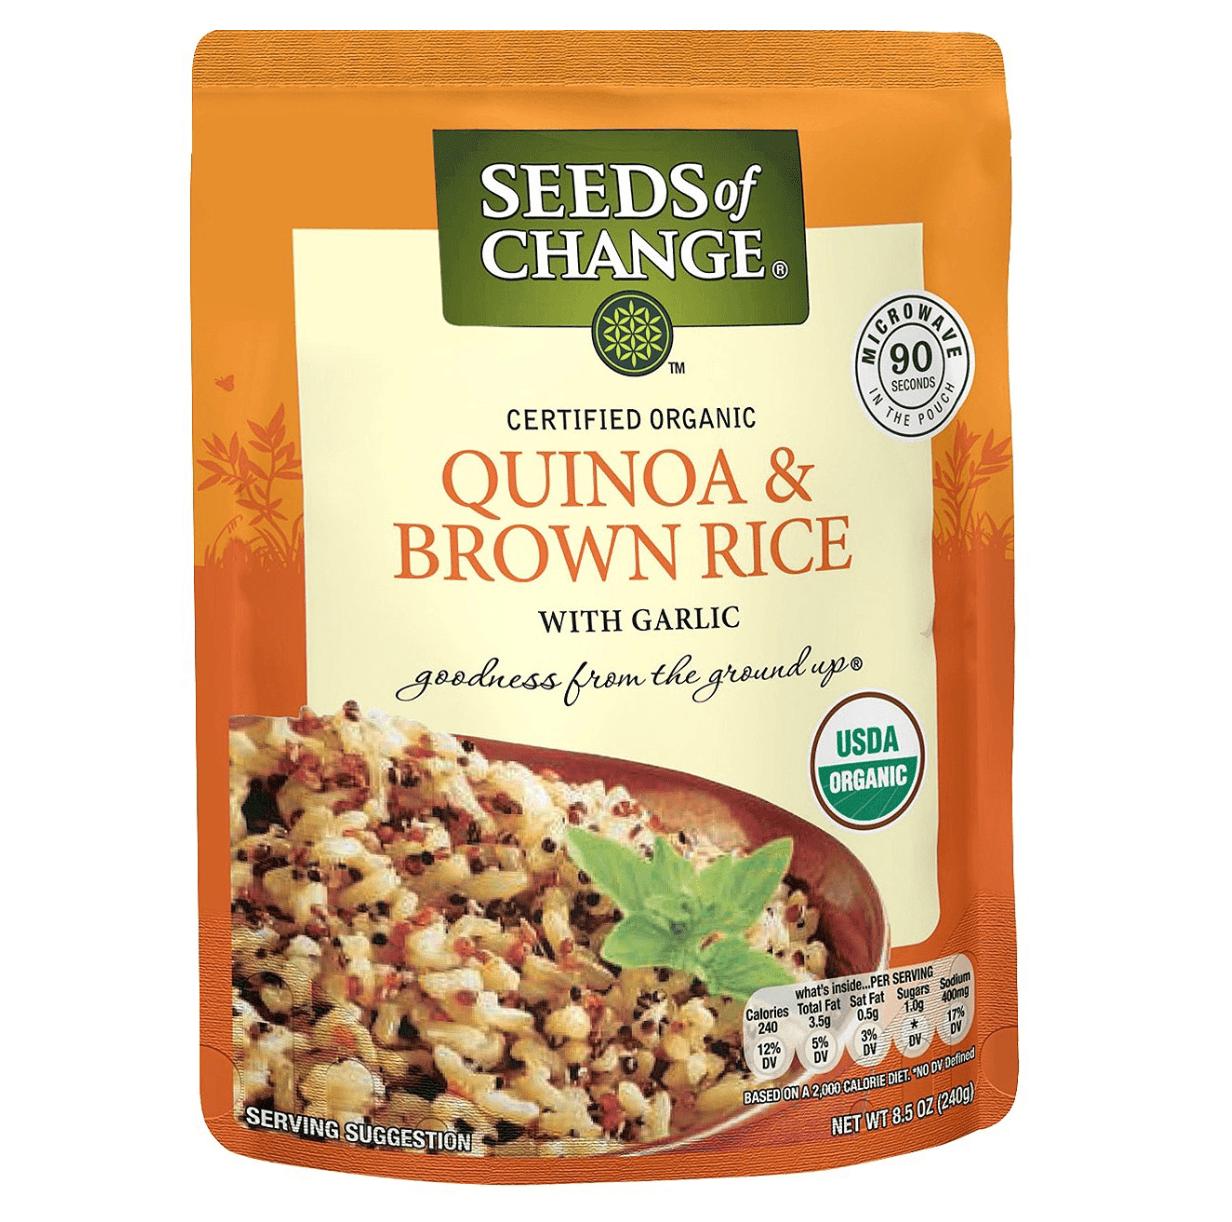 Seeds of Change Quinoa